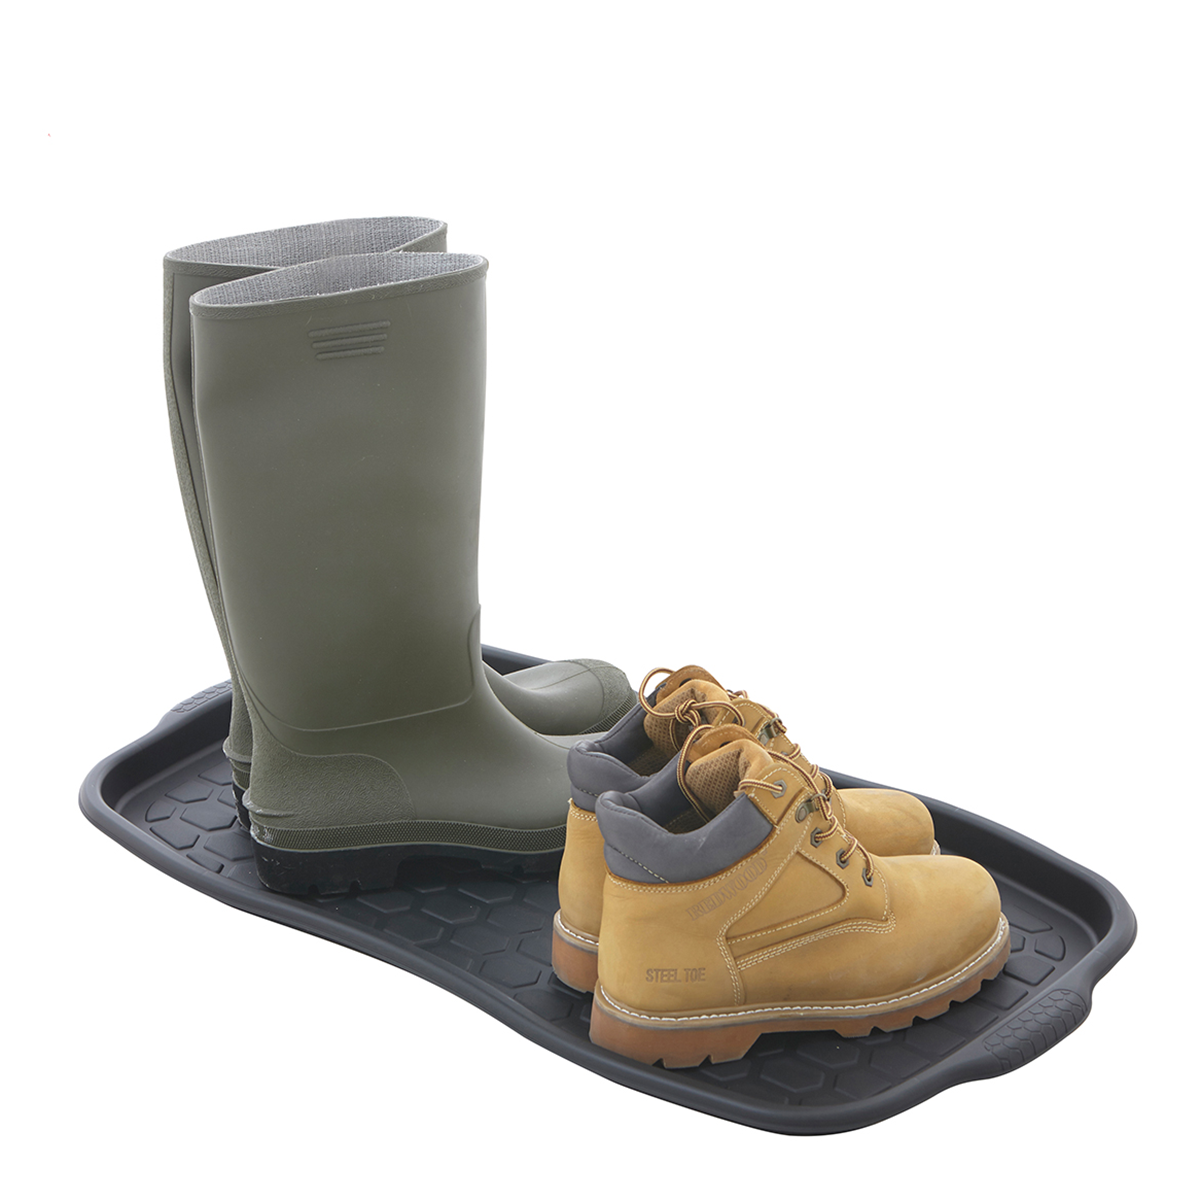 black tidy boot shoe tray entrance mat from bigdug uk